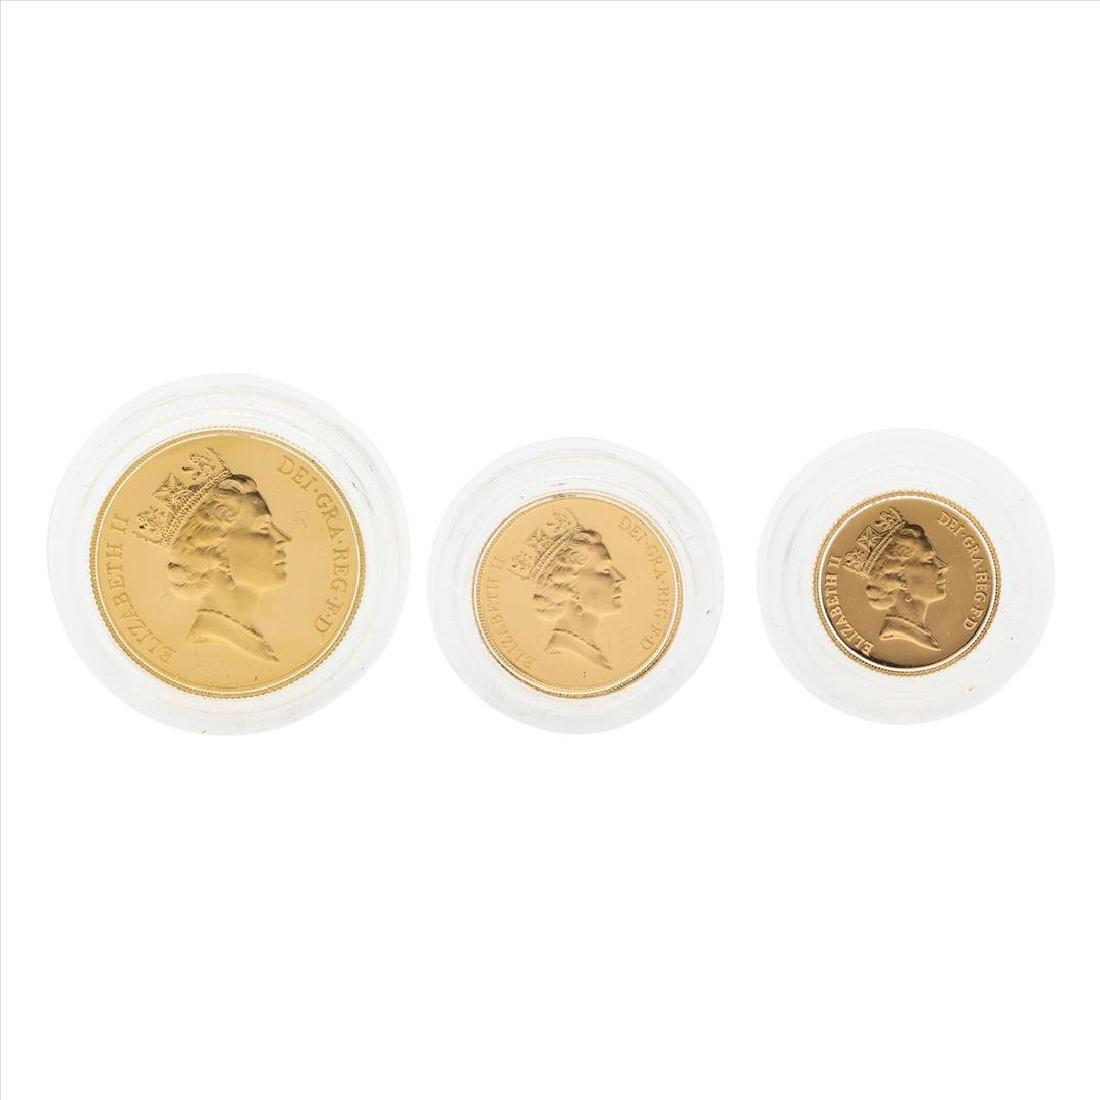 Set of (3) 1987 United Kingdom Gold Proof Coins